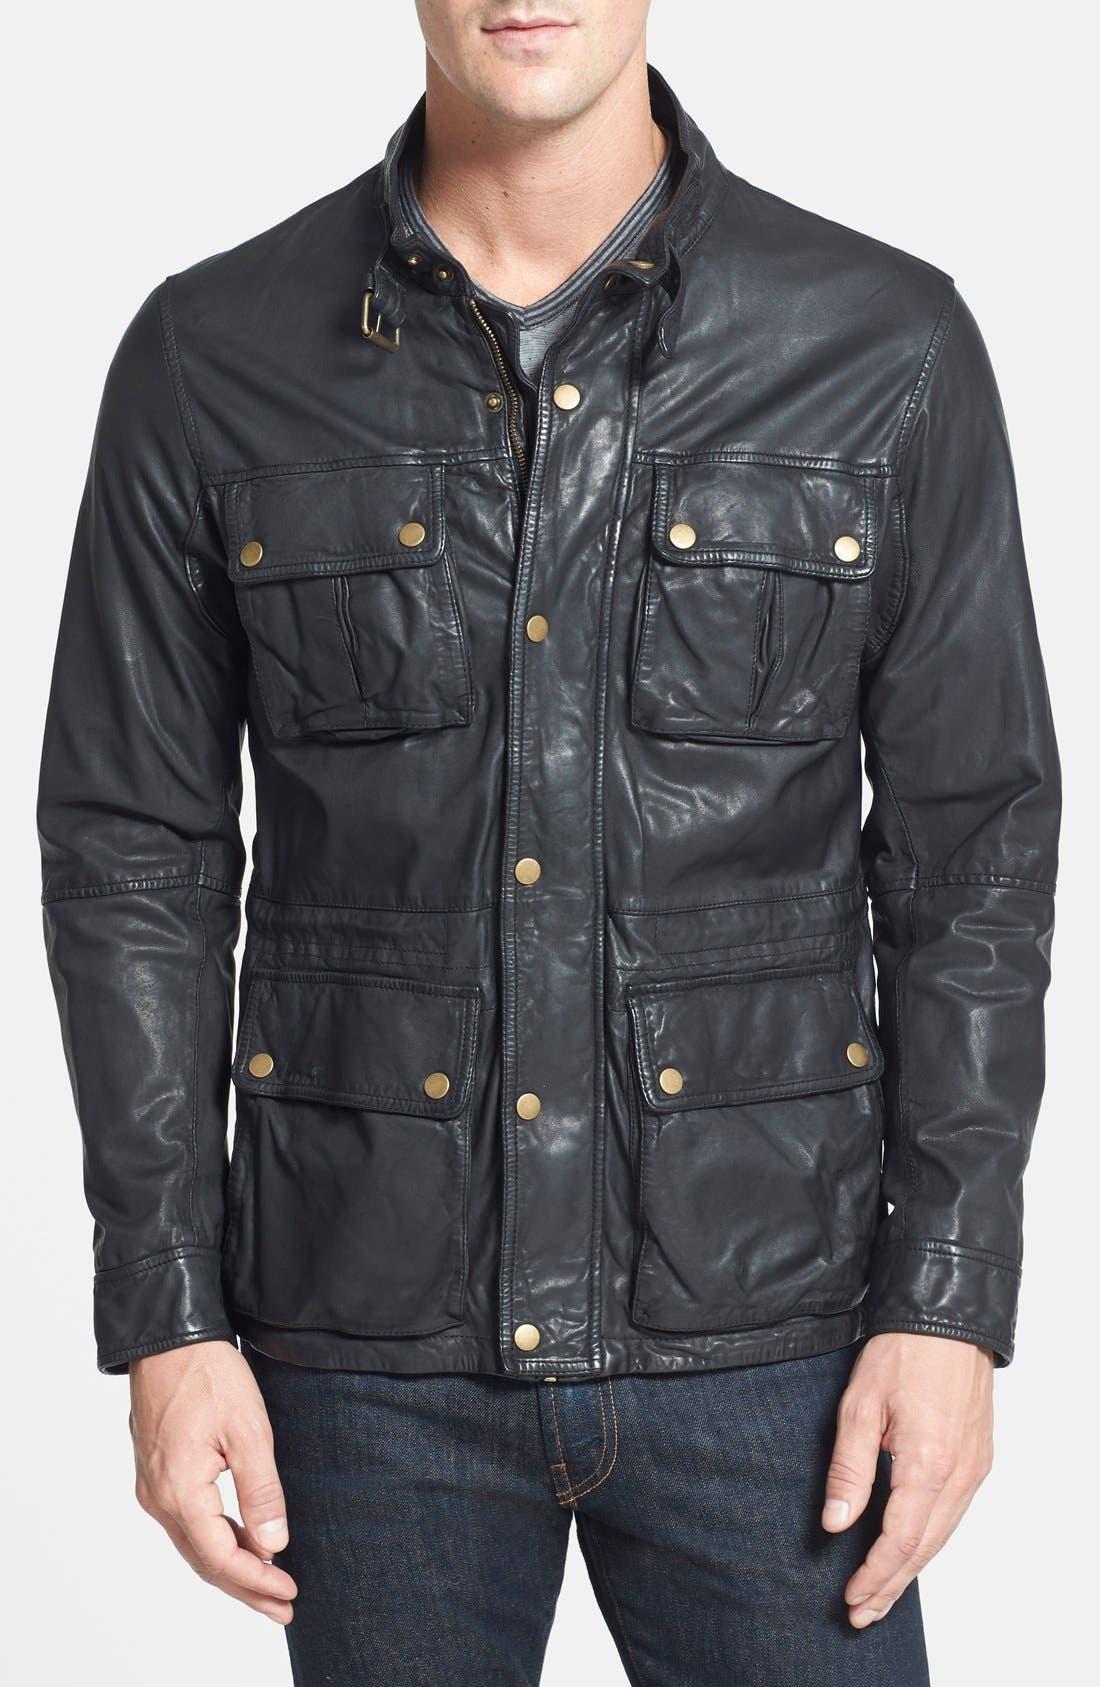 Alternate Image 1 Selected - Cole Haan Vintage Lambskin Leather Jacket